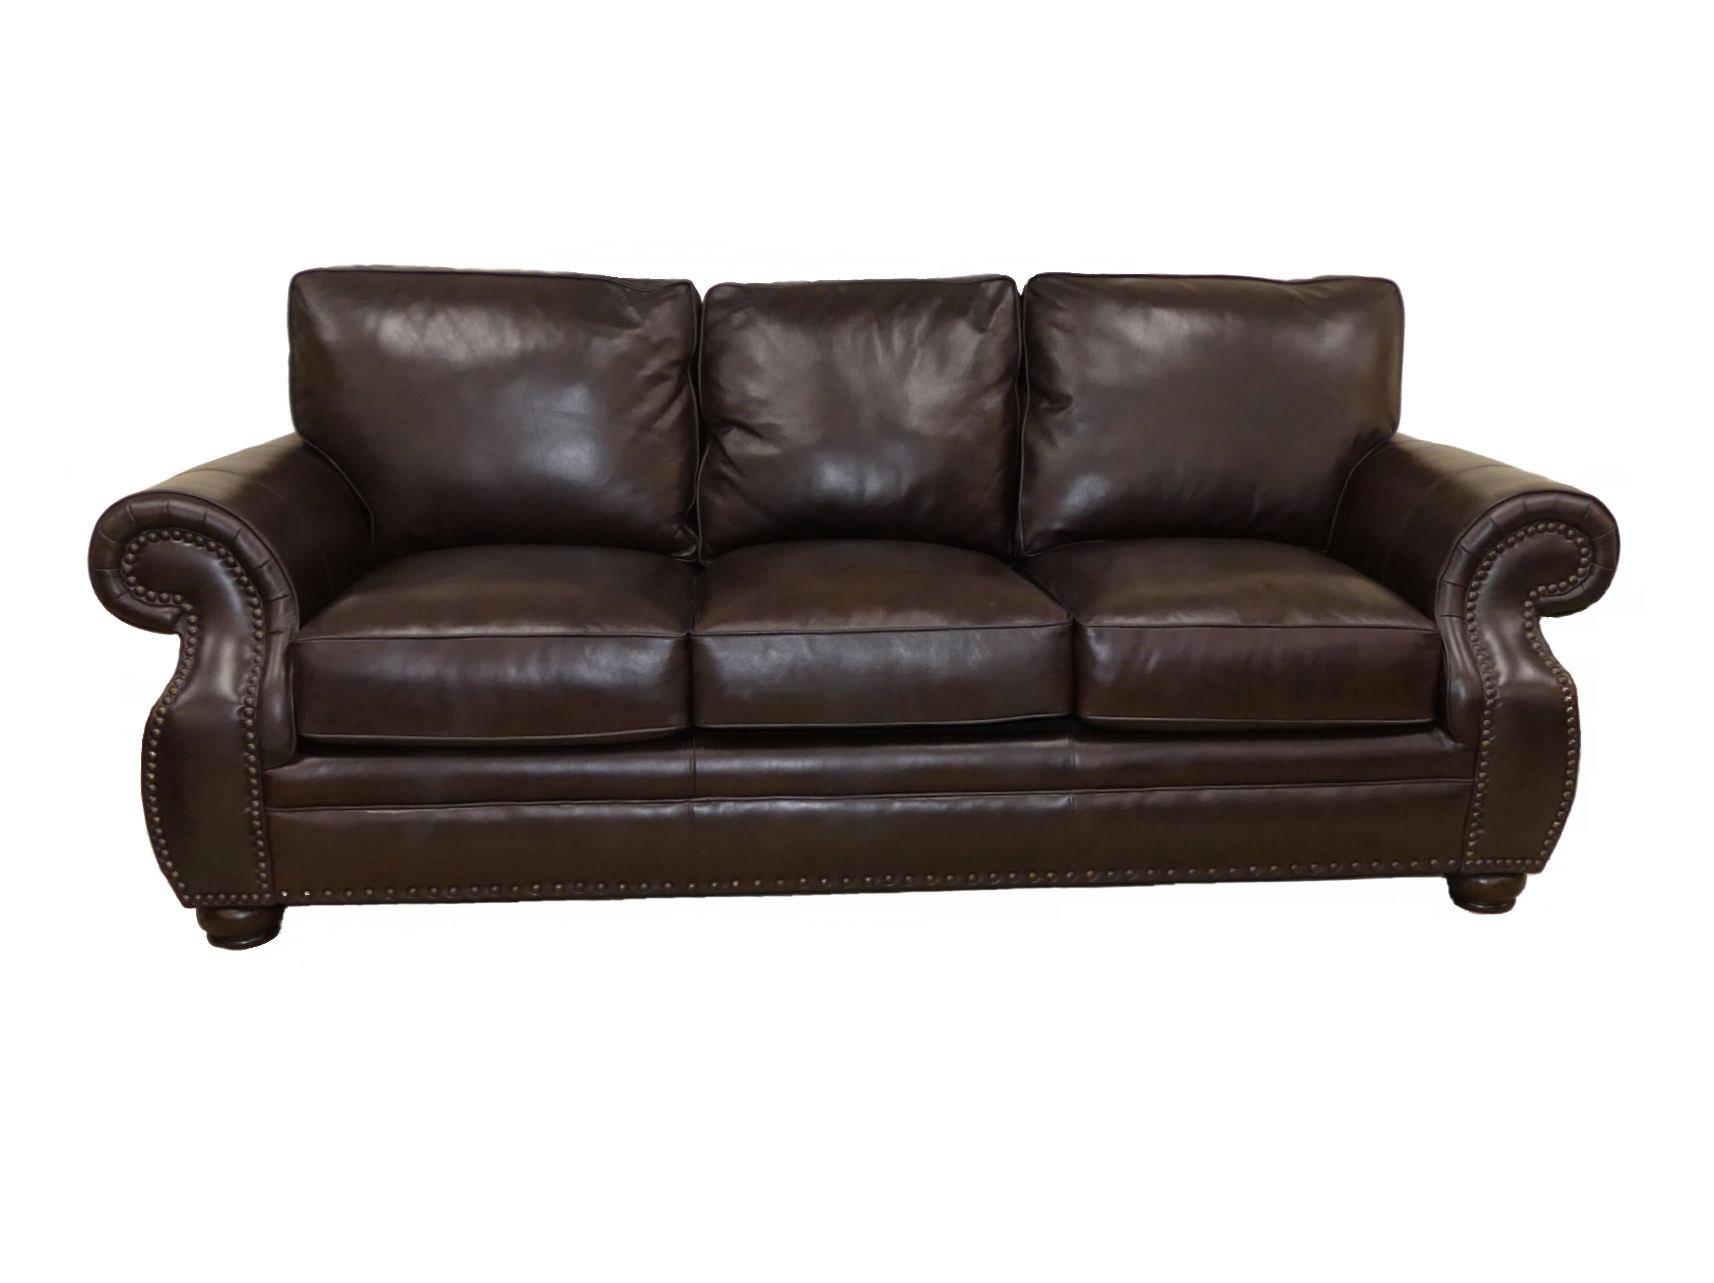 SOLD Bernhardt Furniture Leather Sofa